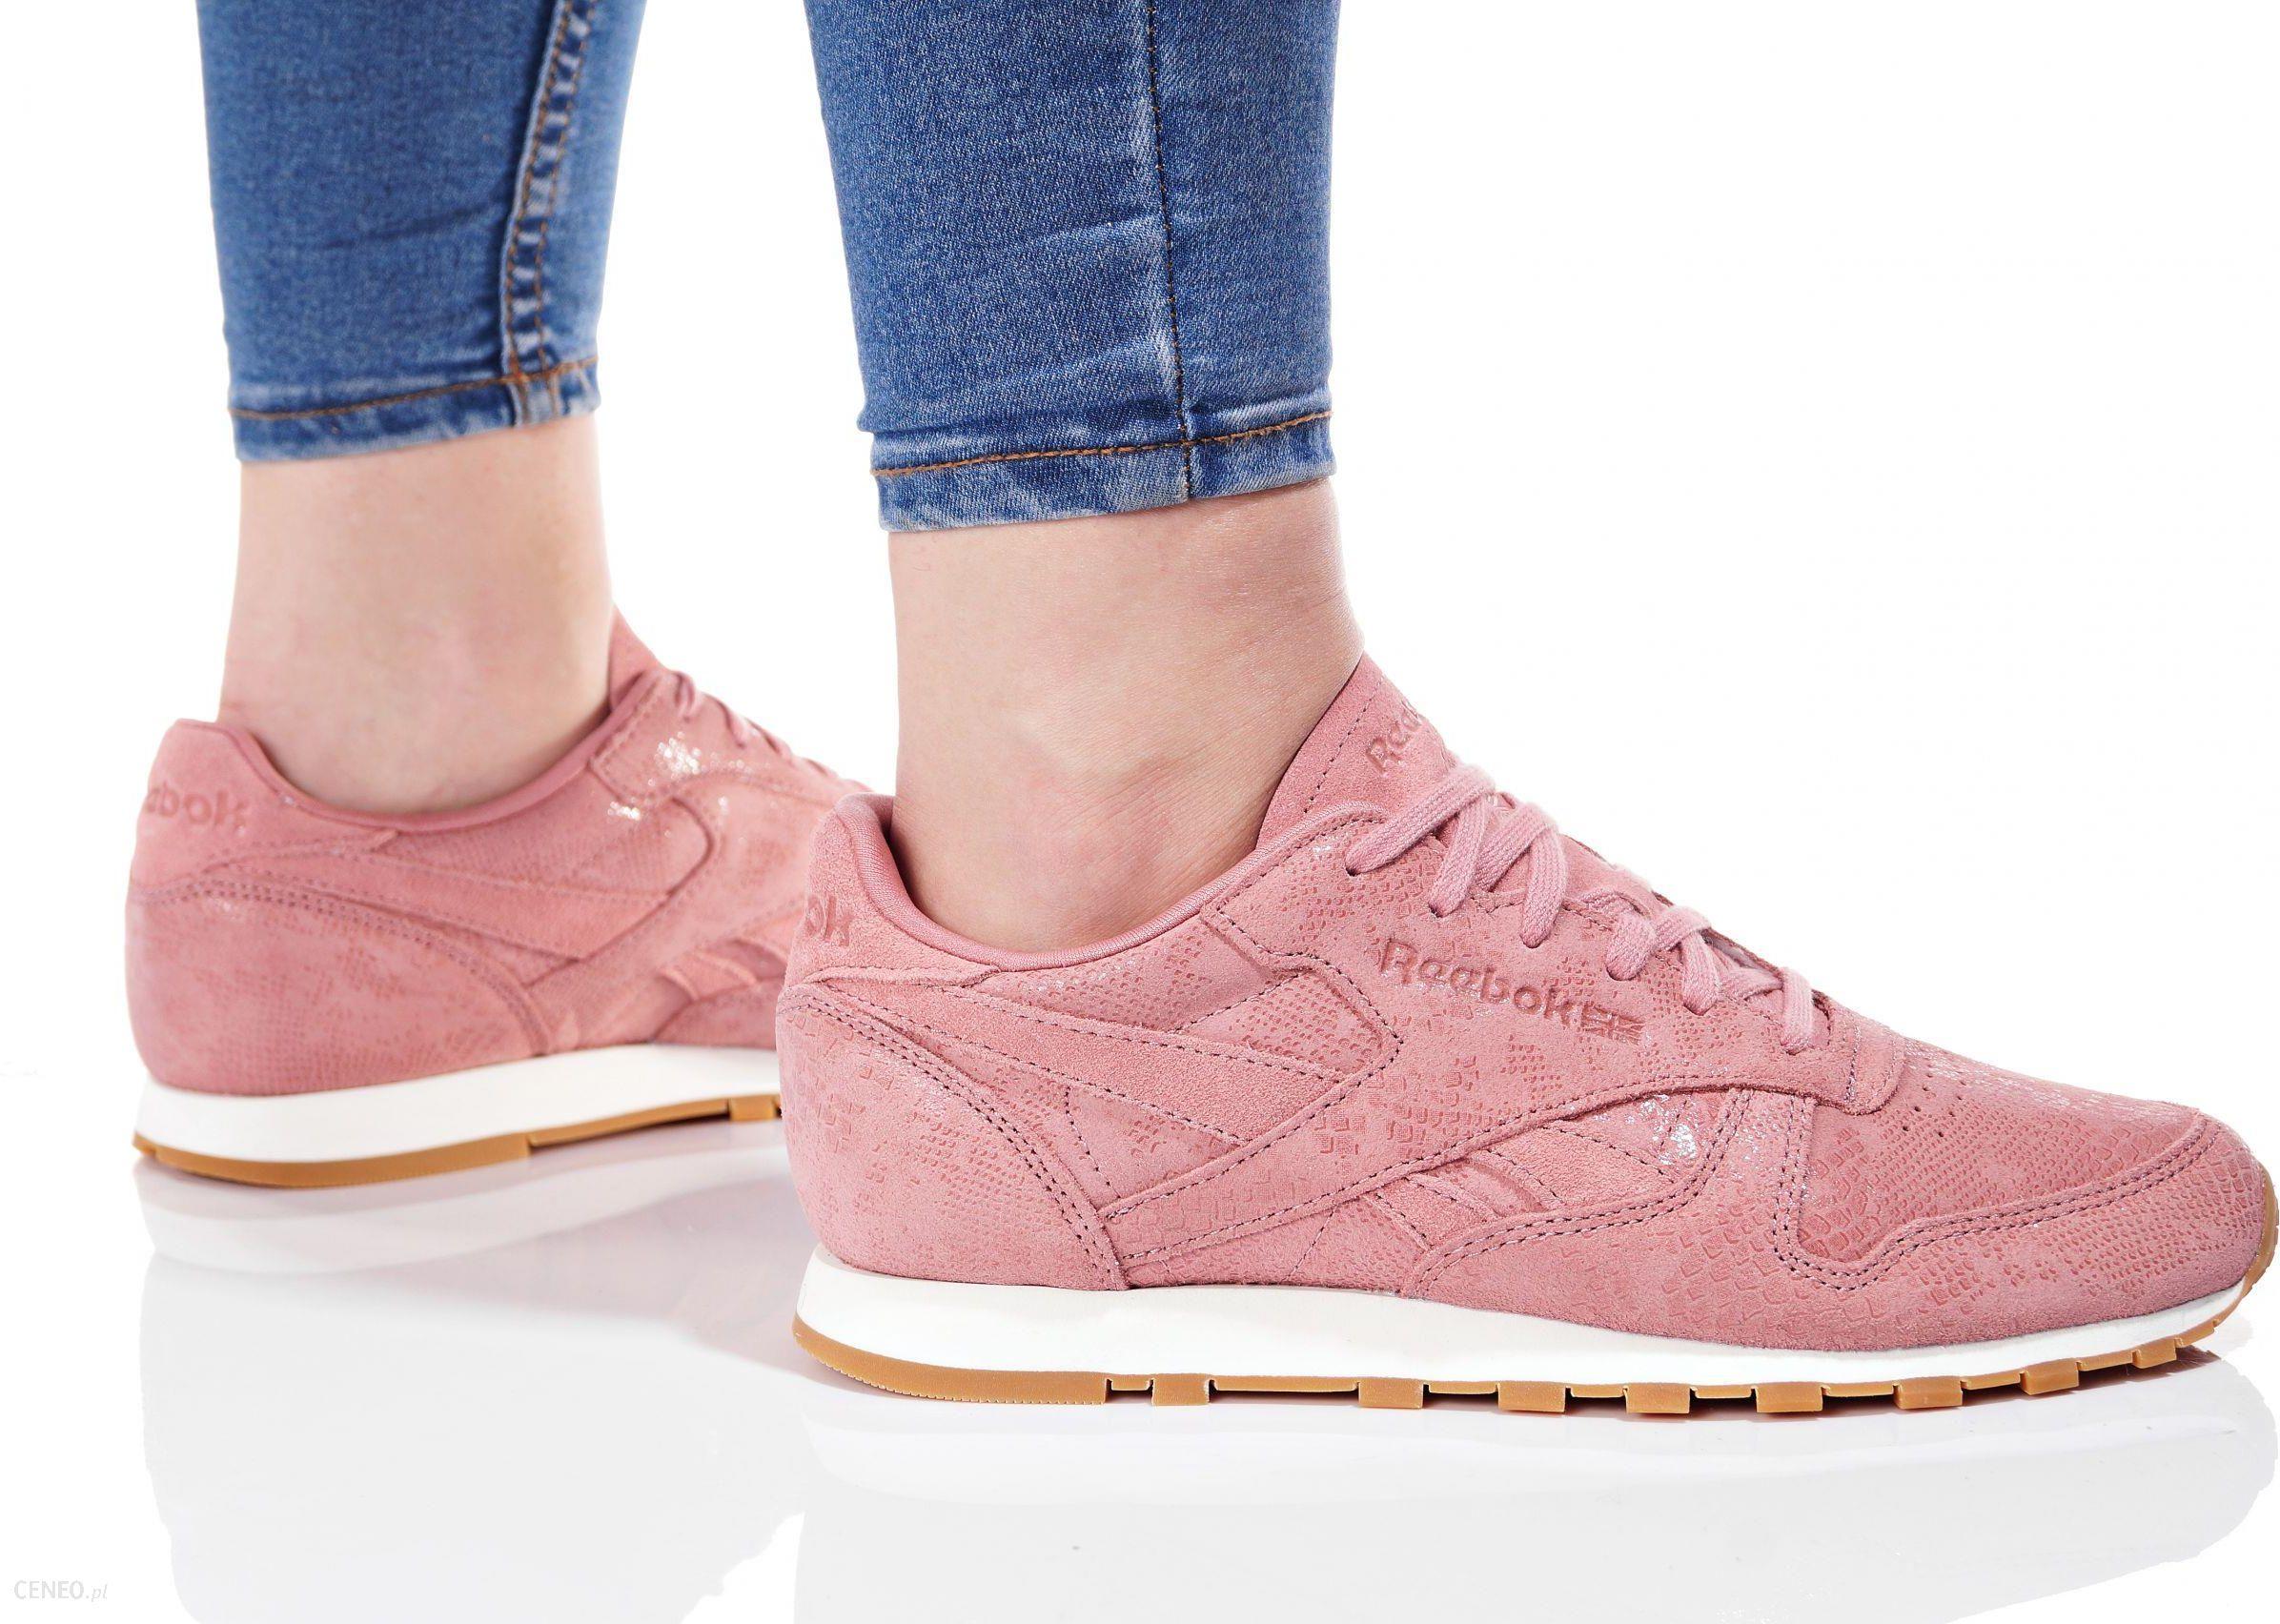 Buty damskie sneakersy Reebok Classic Leather Clean Exotics BS8226 RÓŻOWY